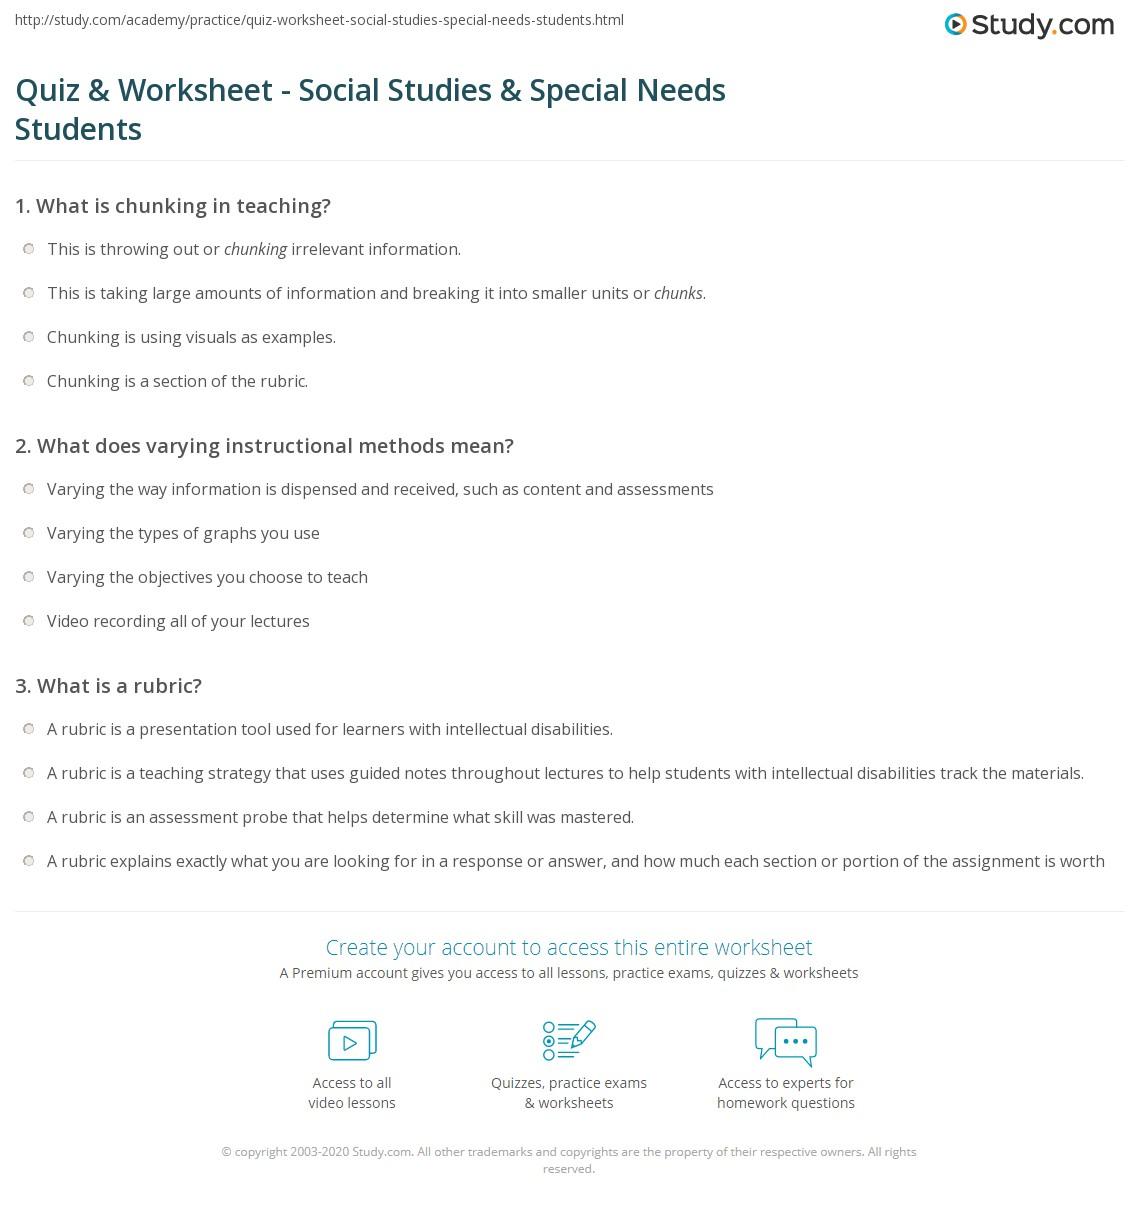 Quiz Worksheet Social Studies Special Needs Students Study